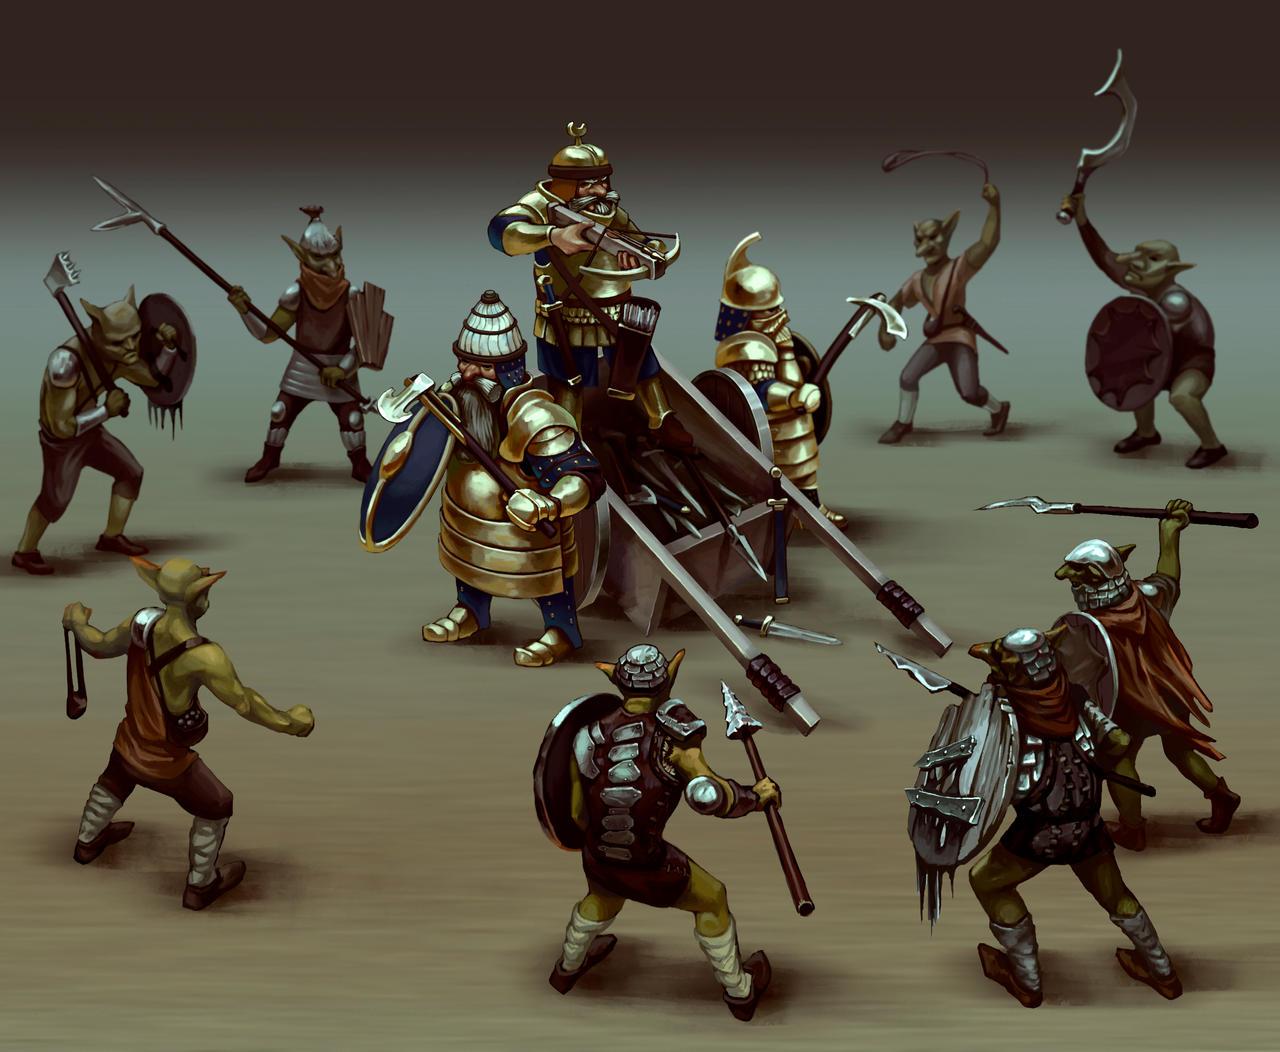 Dwarves and Goblins Fantasy Scene